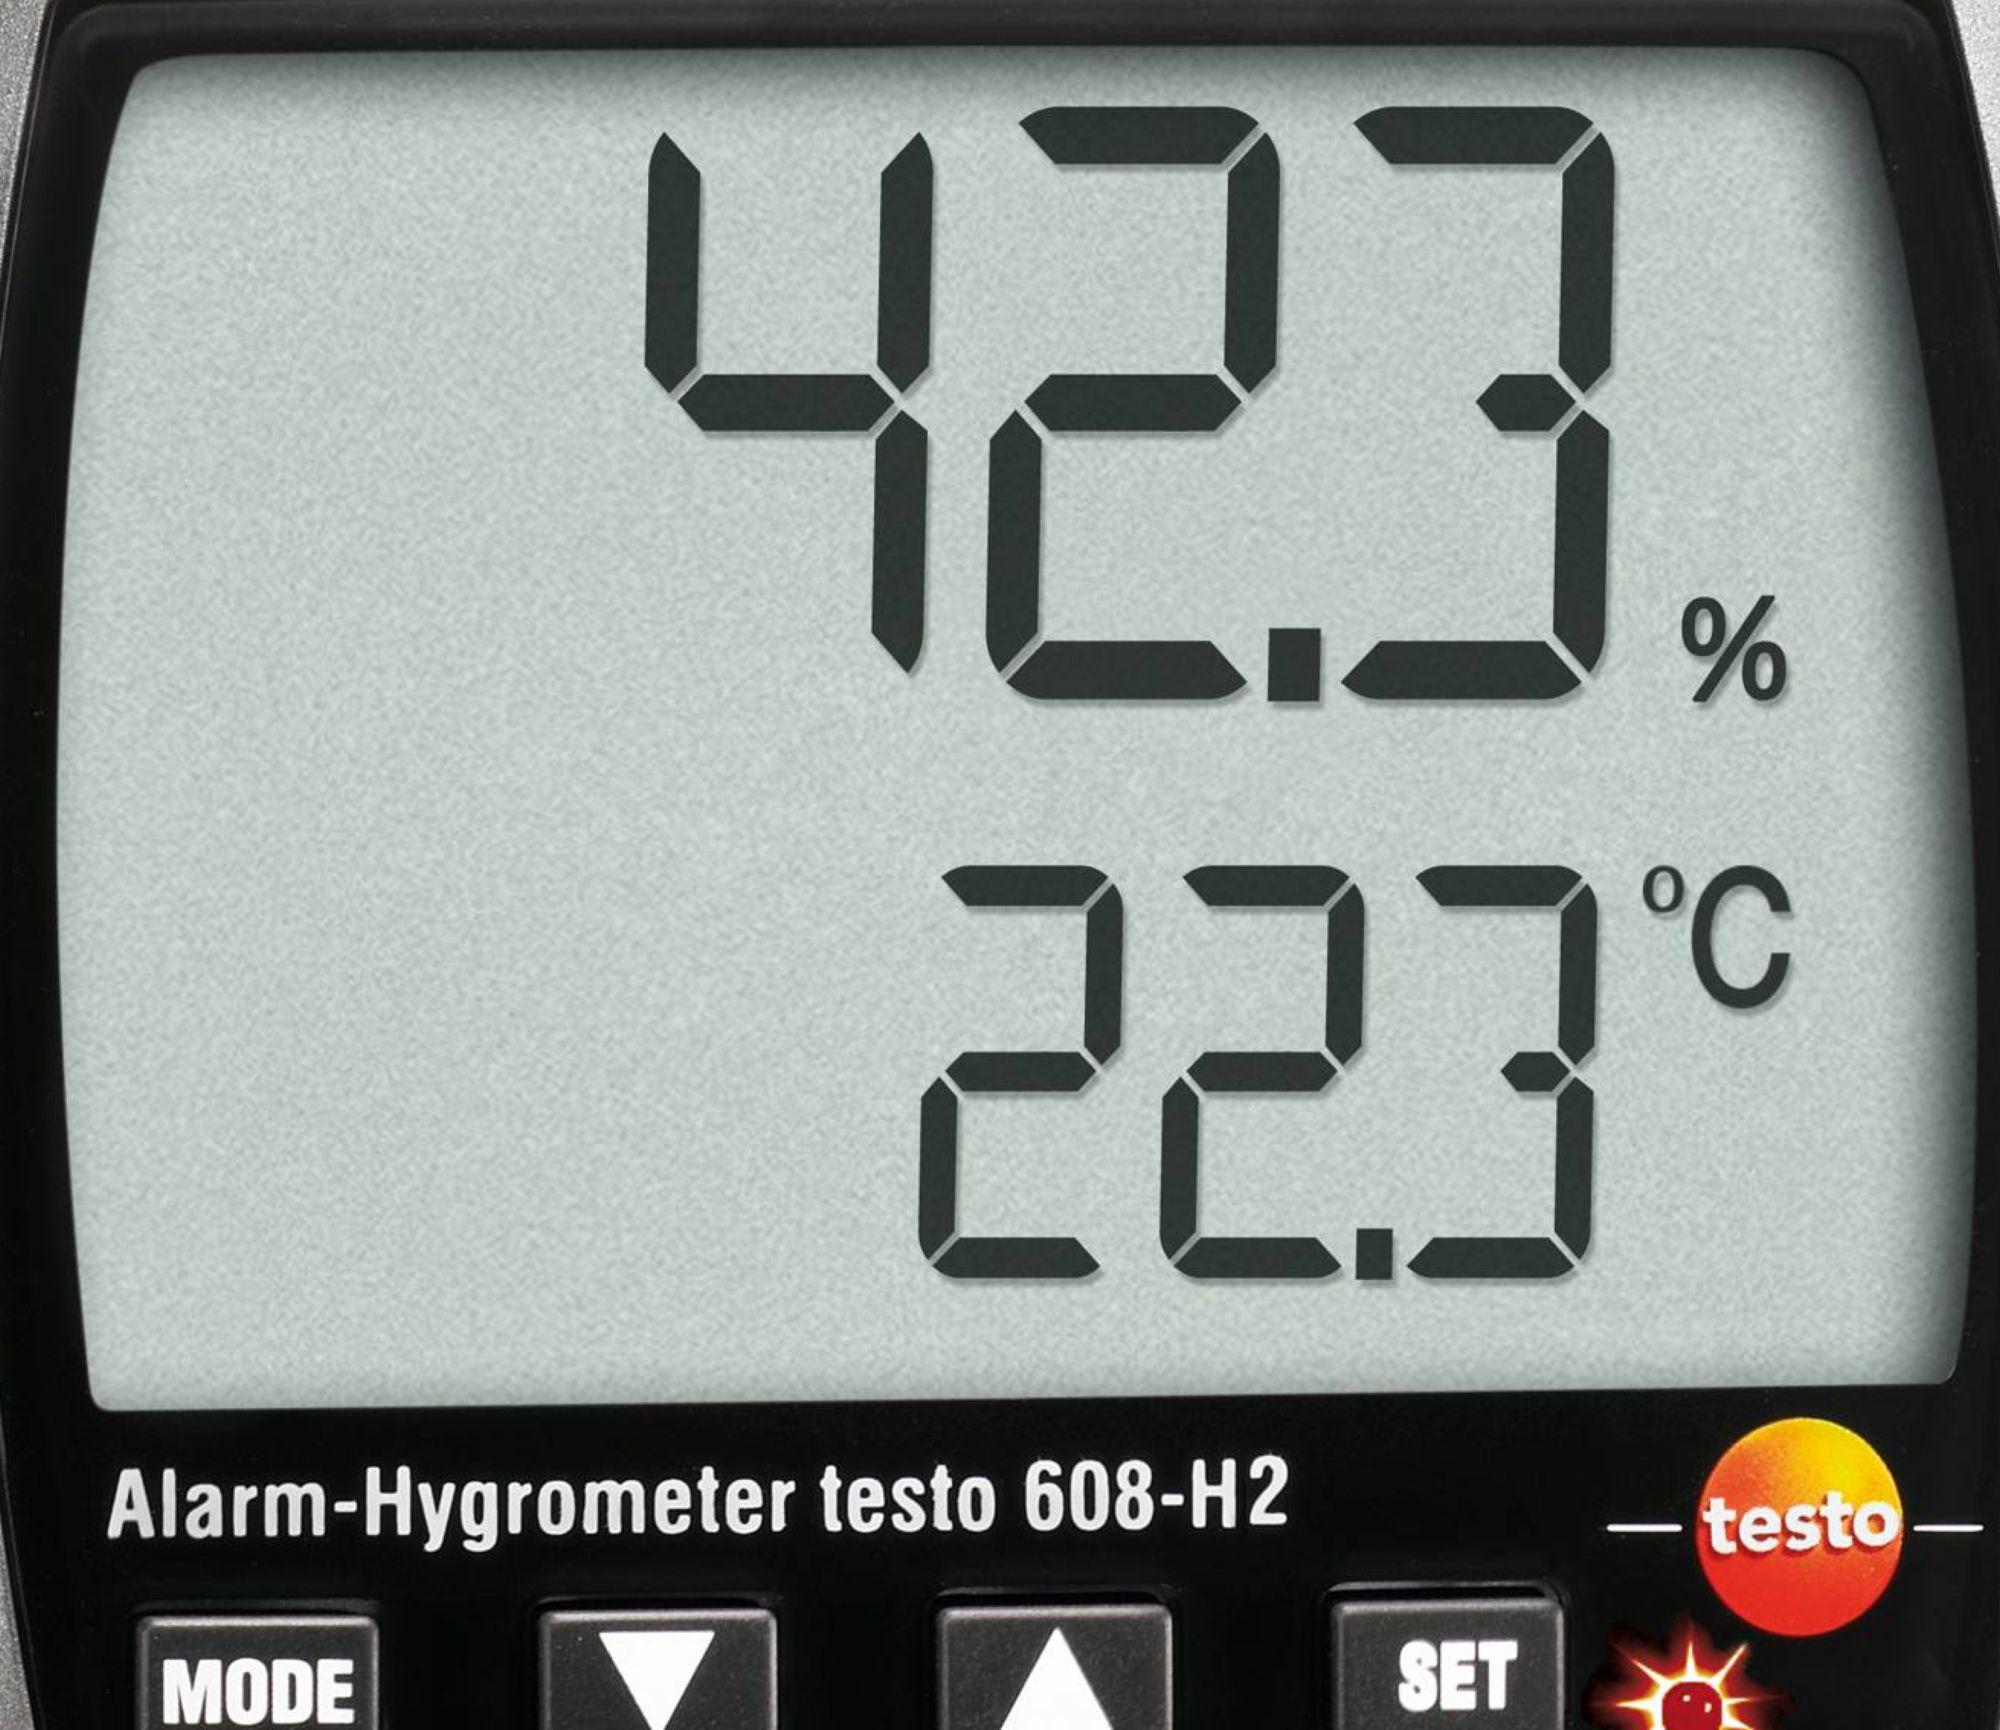 testo 608-H2 termohigrómetro